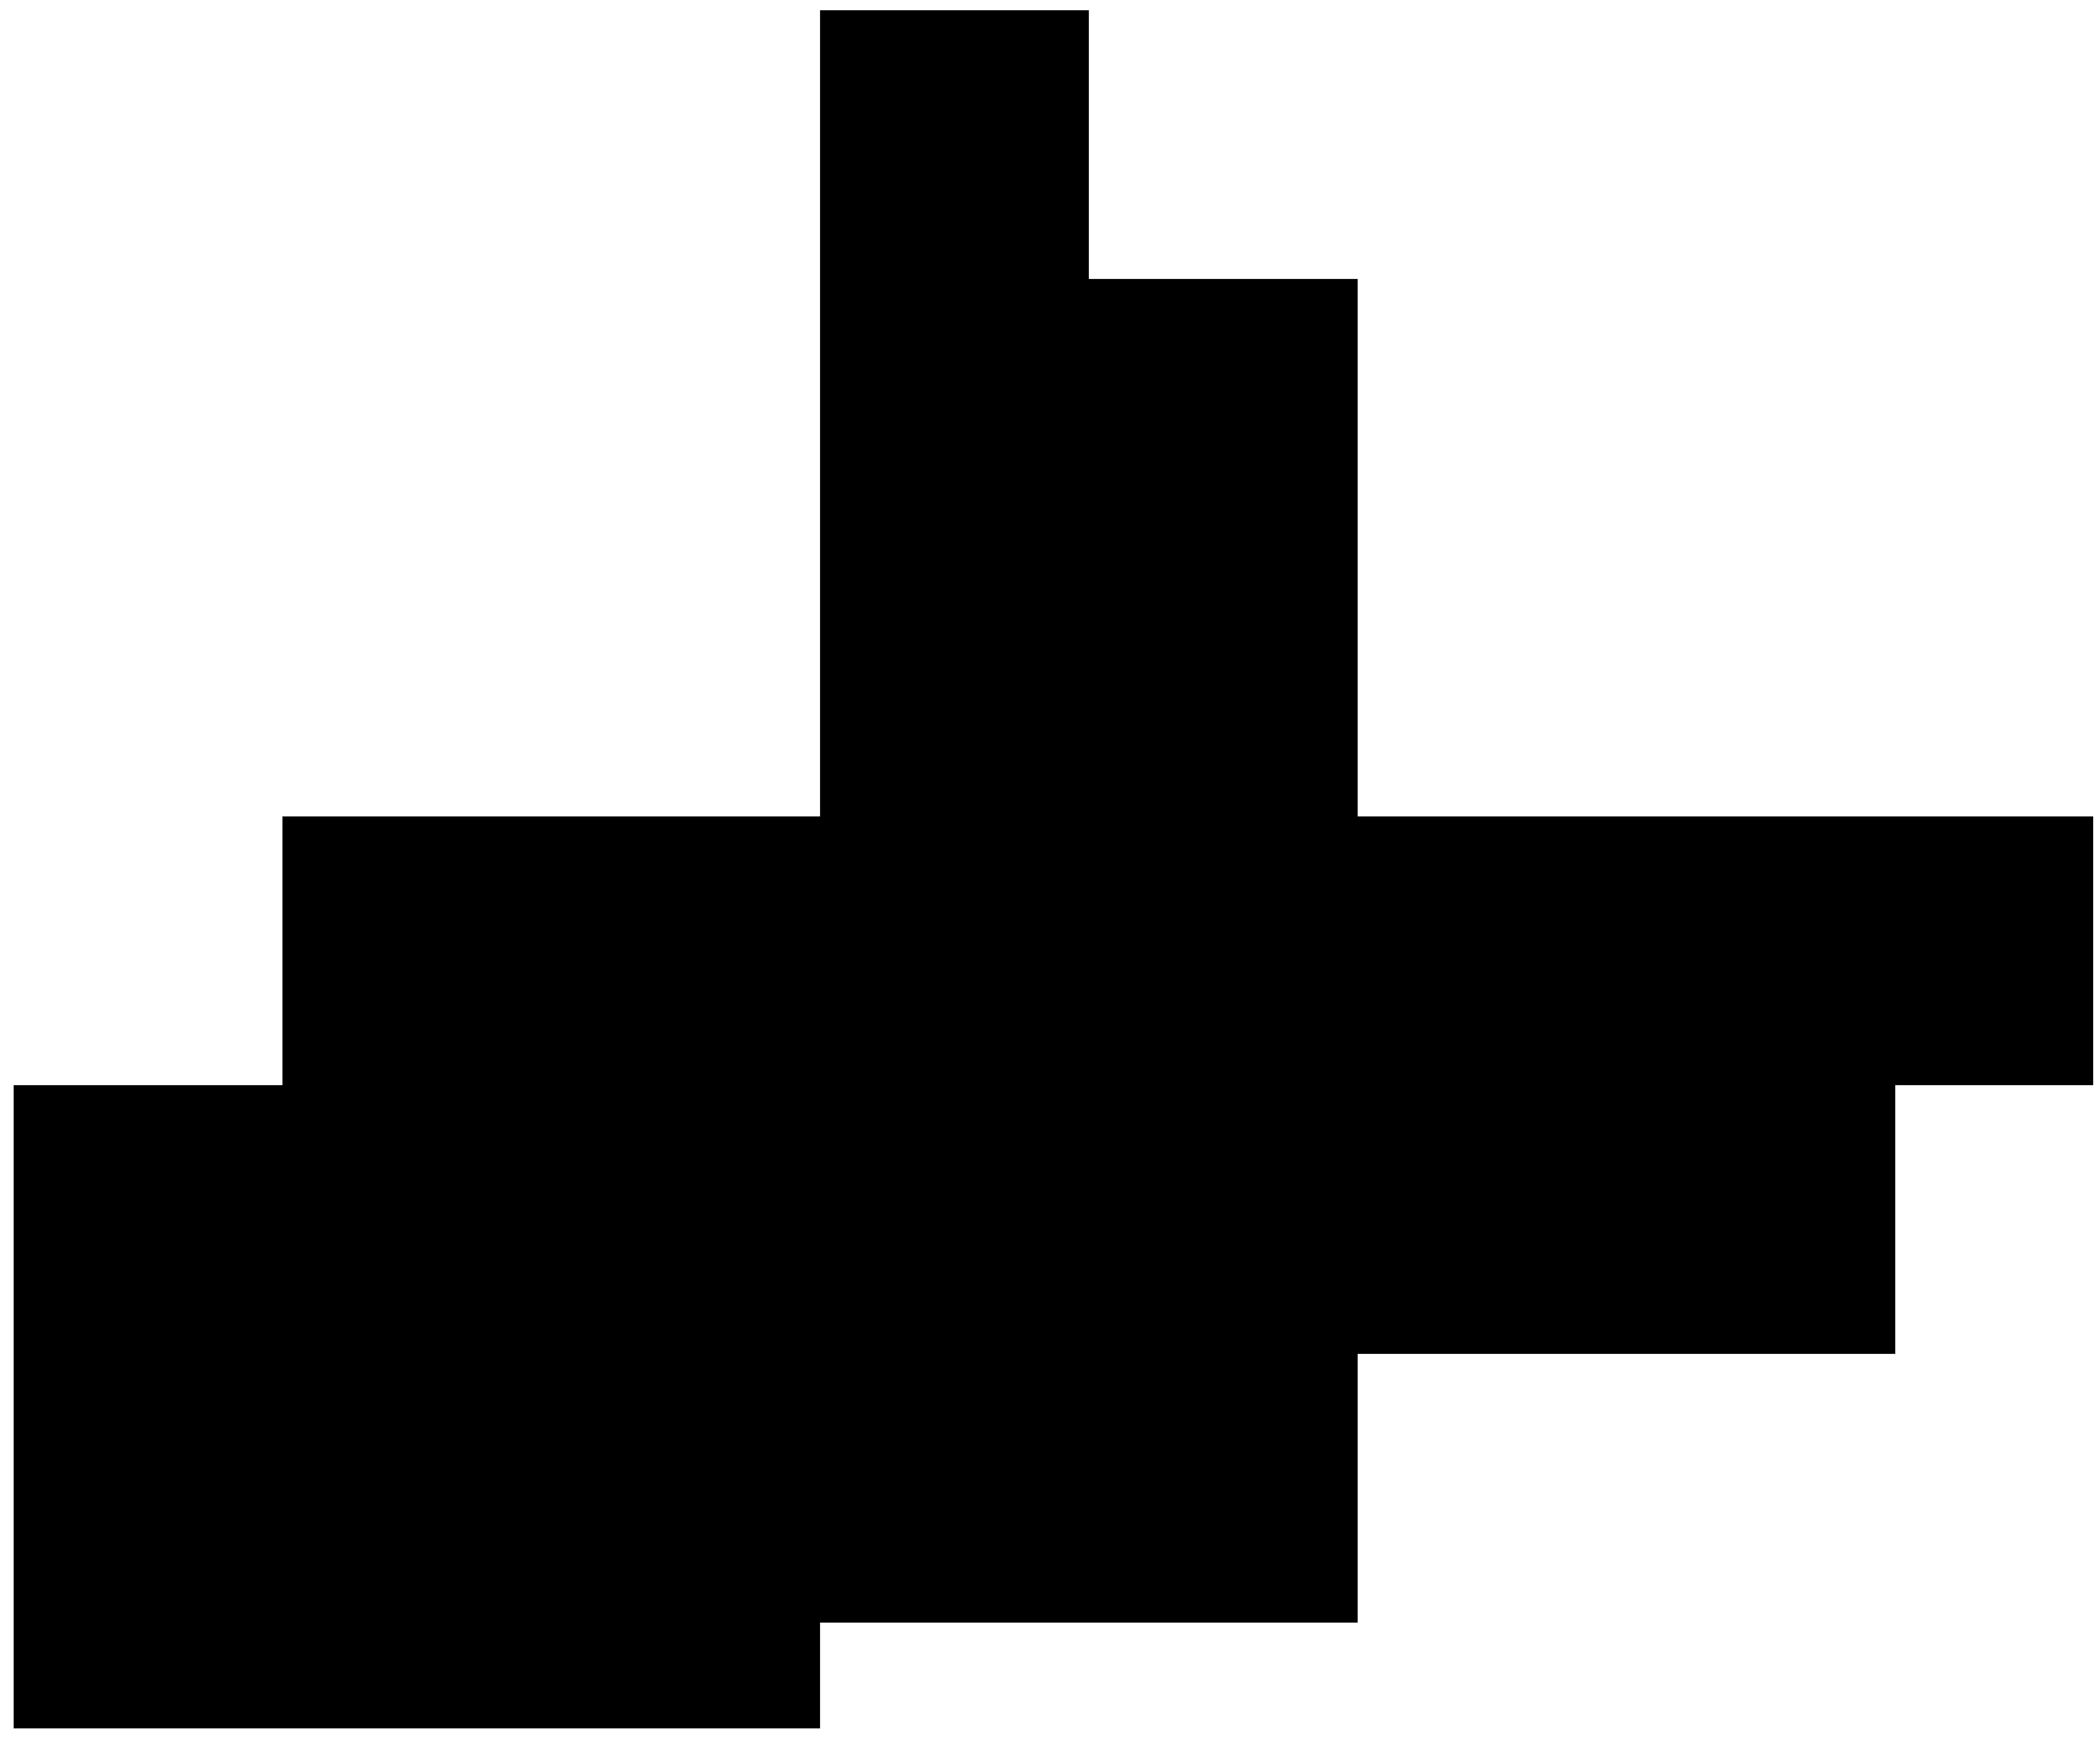 8000x6676 Scuba Diver Silhouette Png Clip Artu200b Gallery Yopriceville